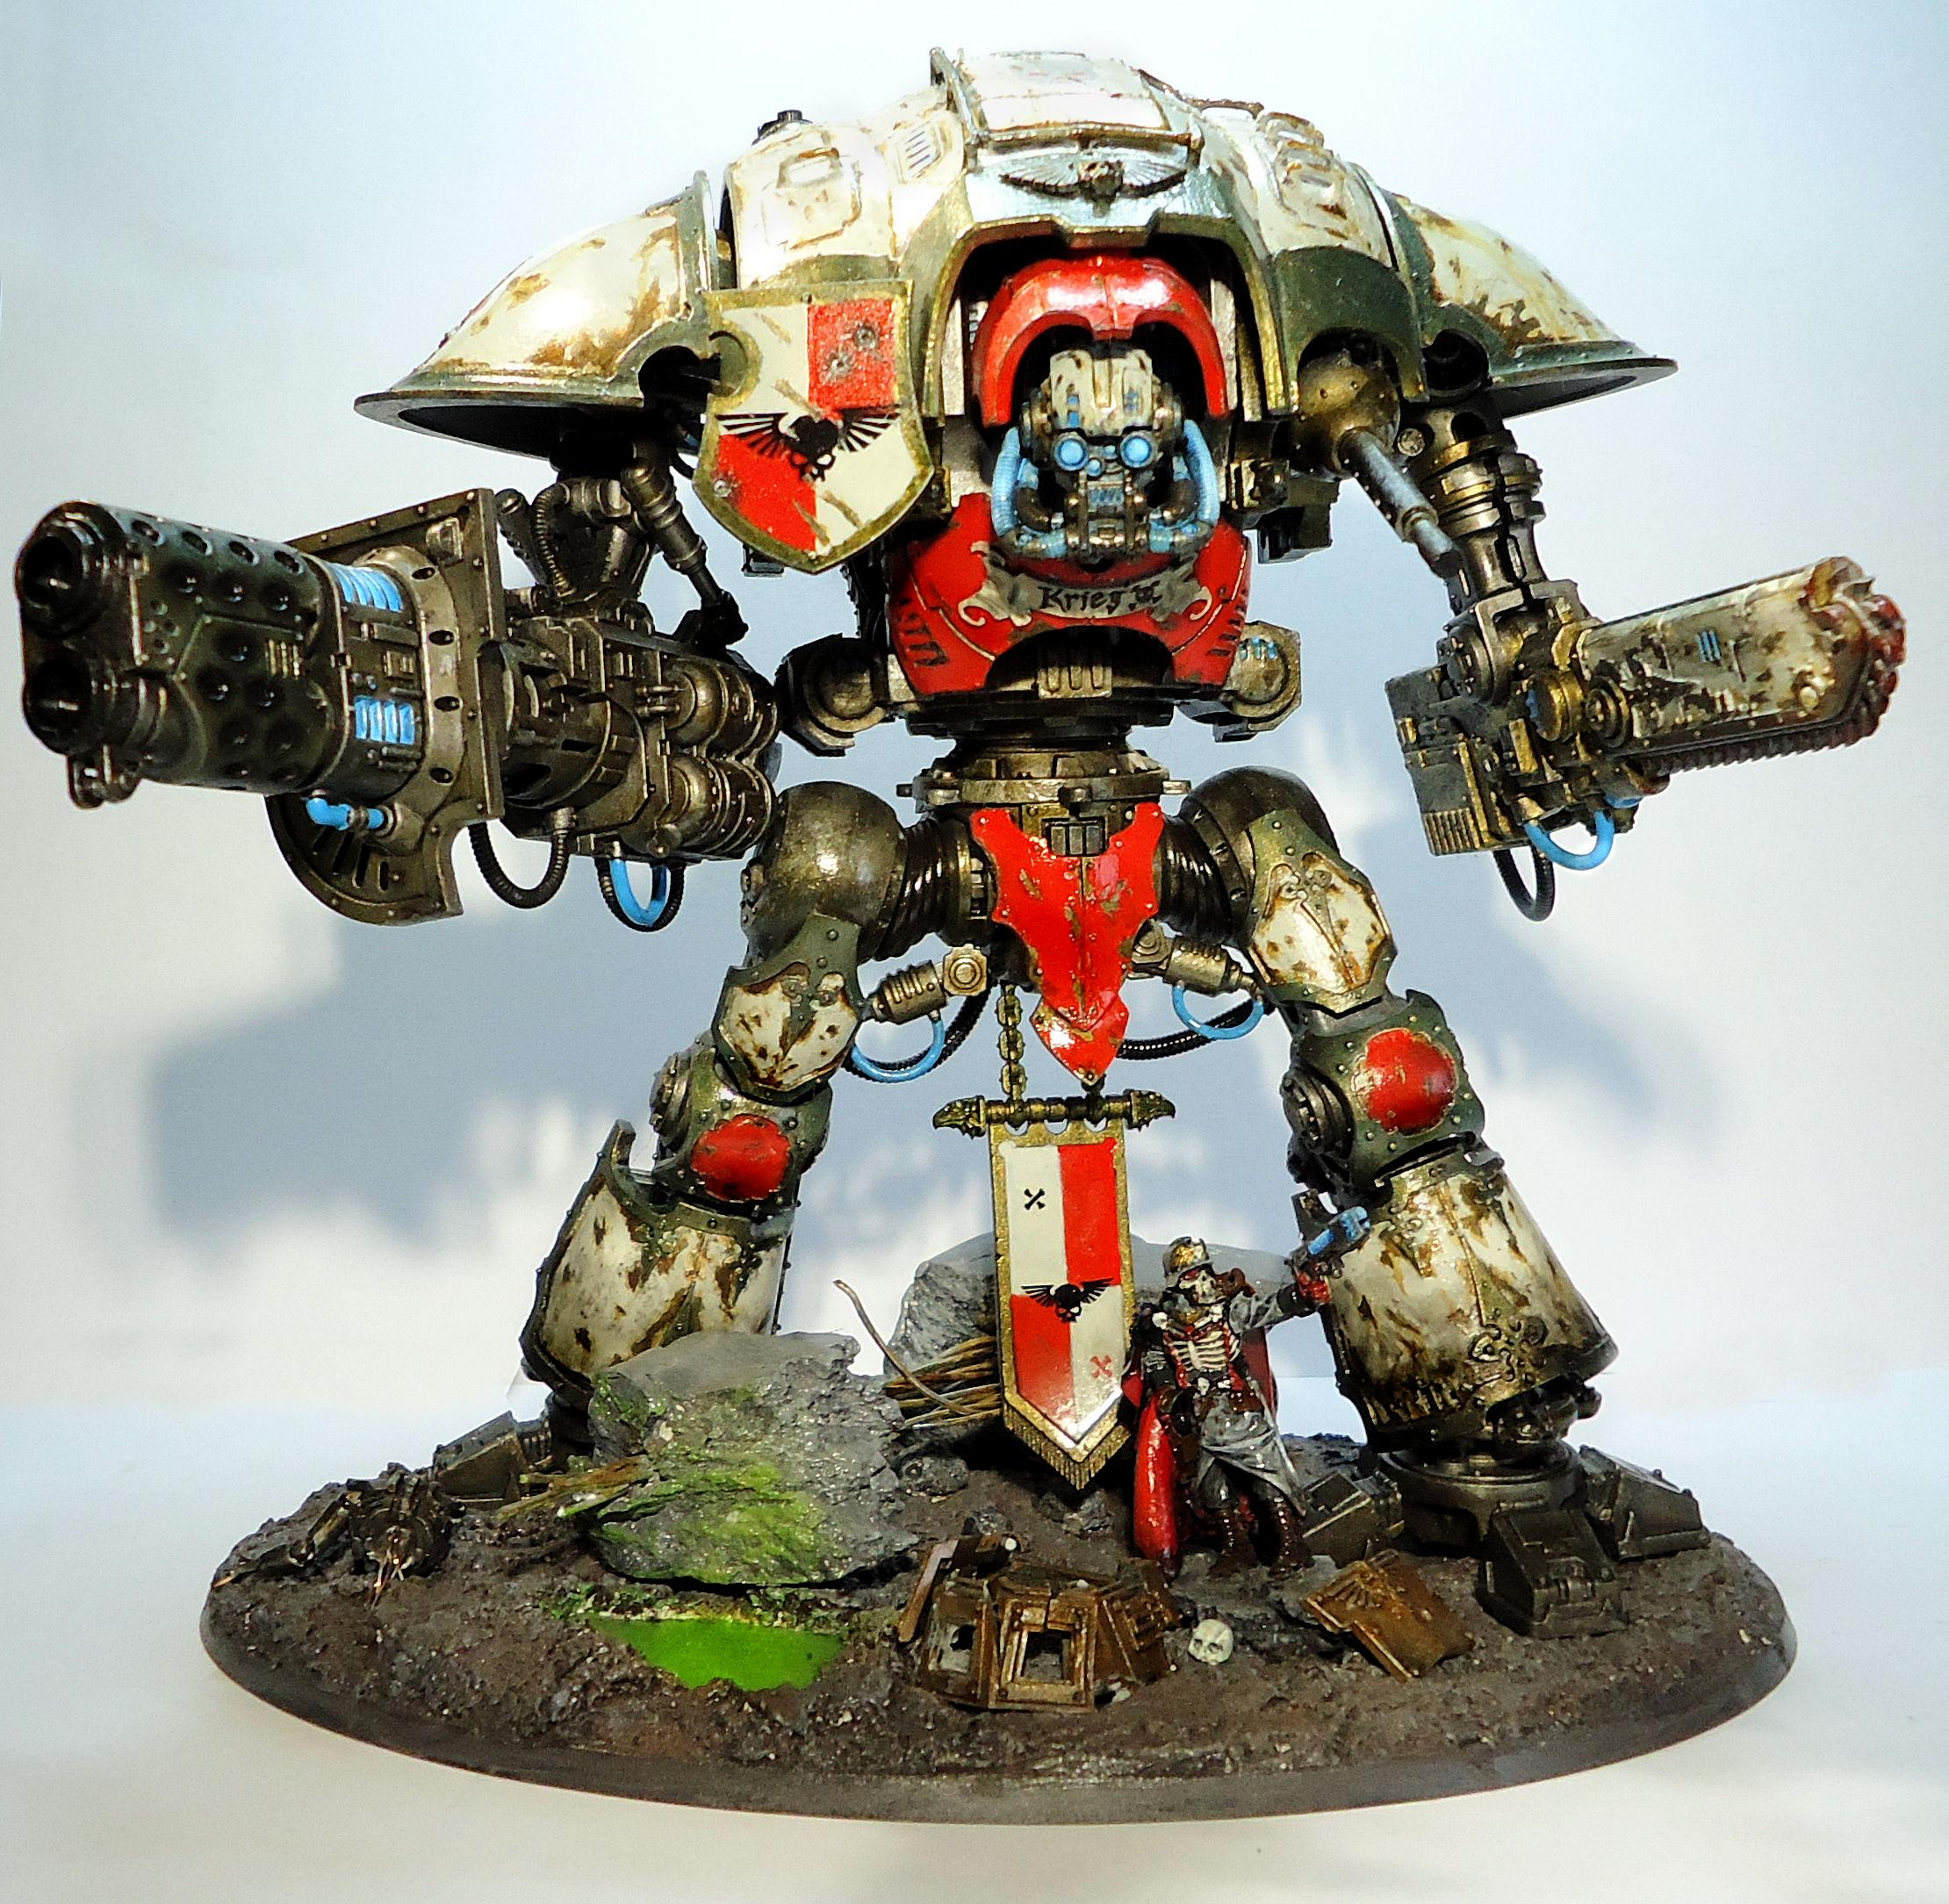 Death Korps of Krieg, Diorama, Ik, Imperial Knight, Warhammer 40,000